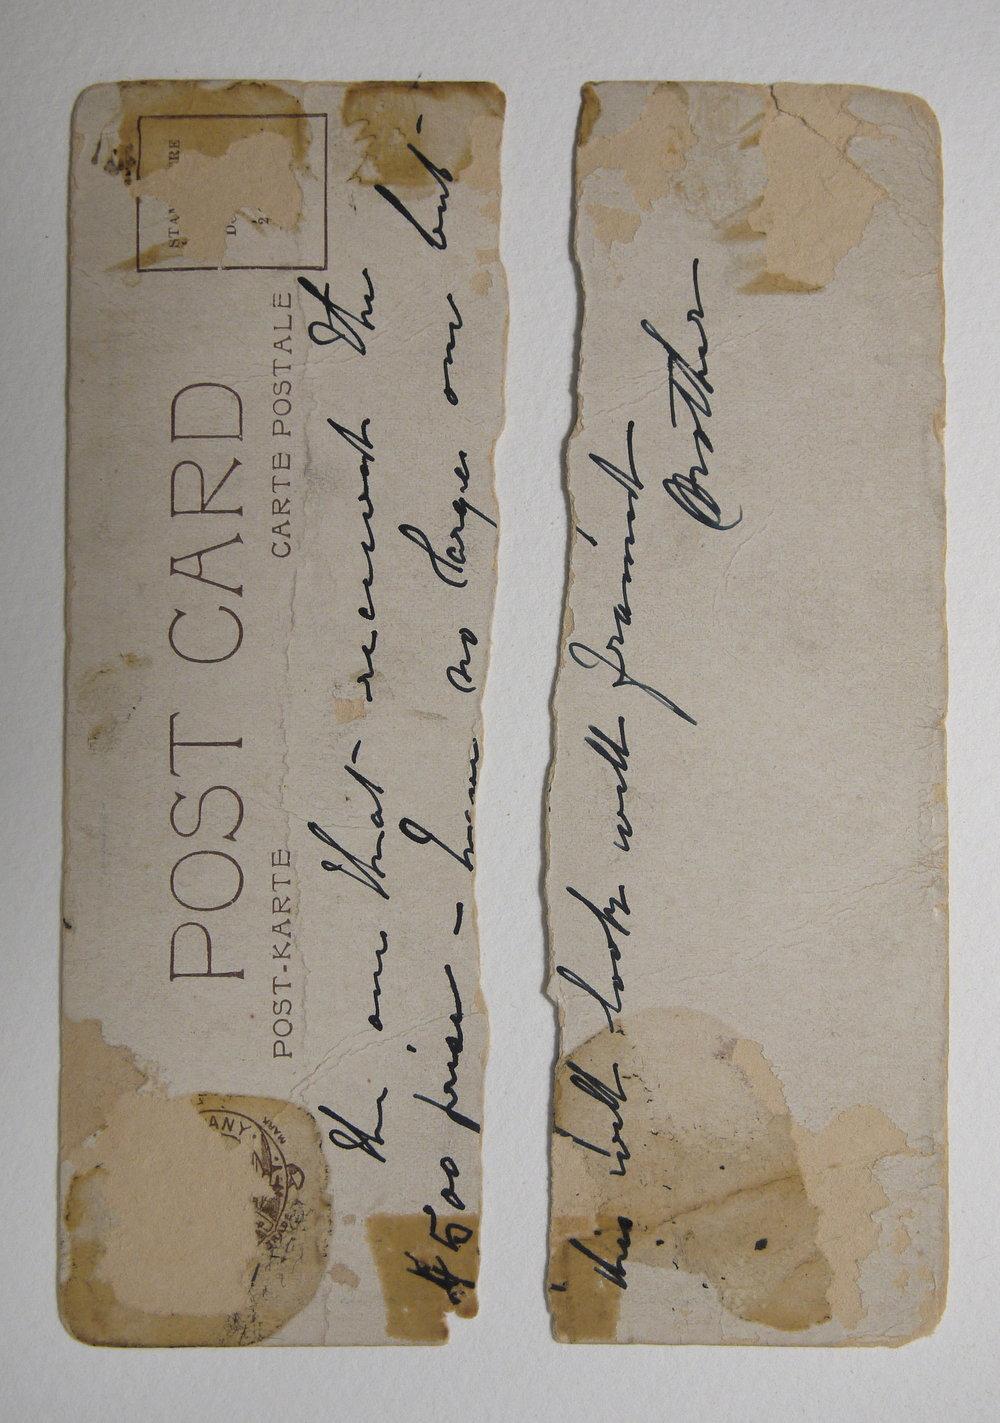 Verso of postcard showing handwritten message.